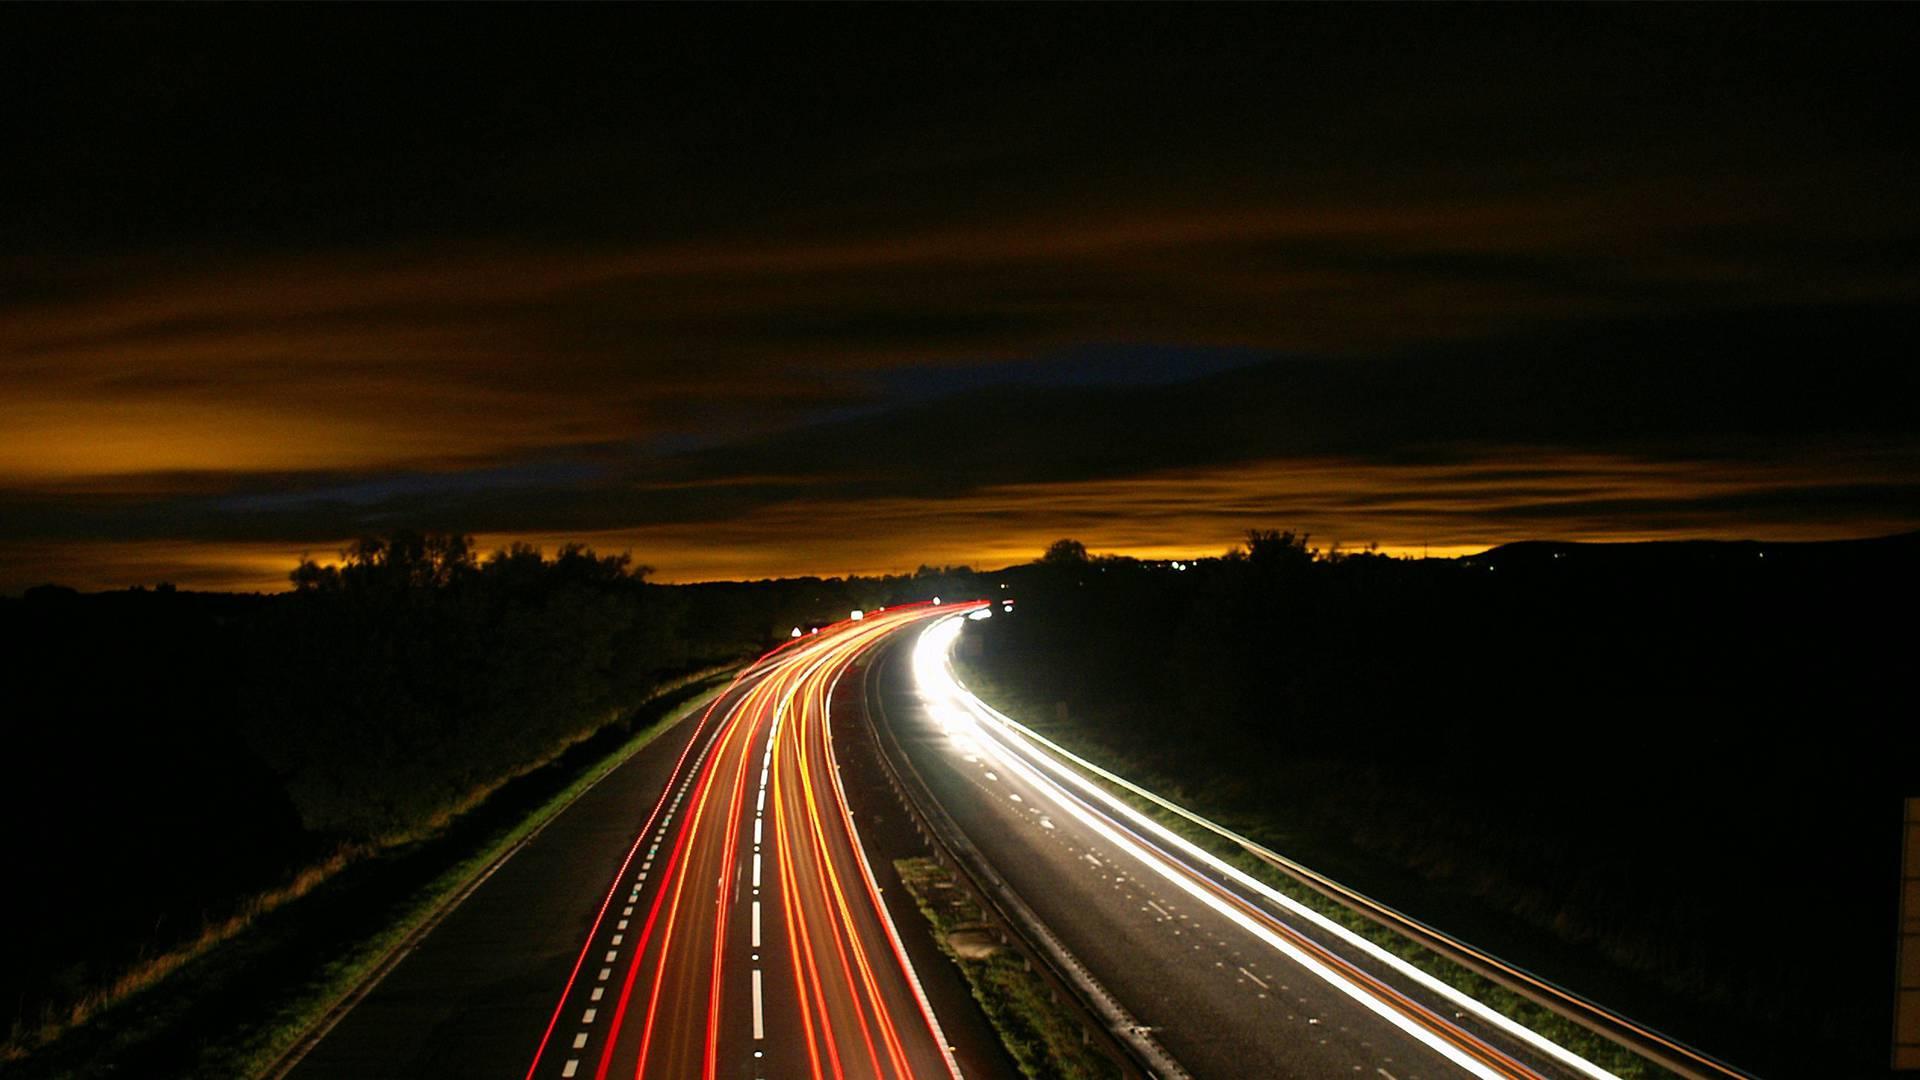 Autovía de noche